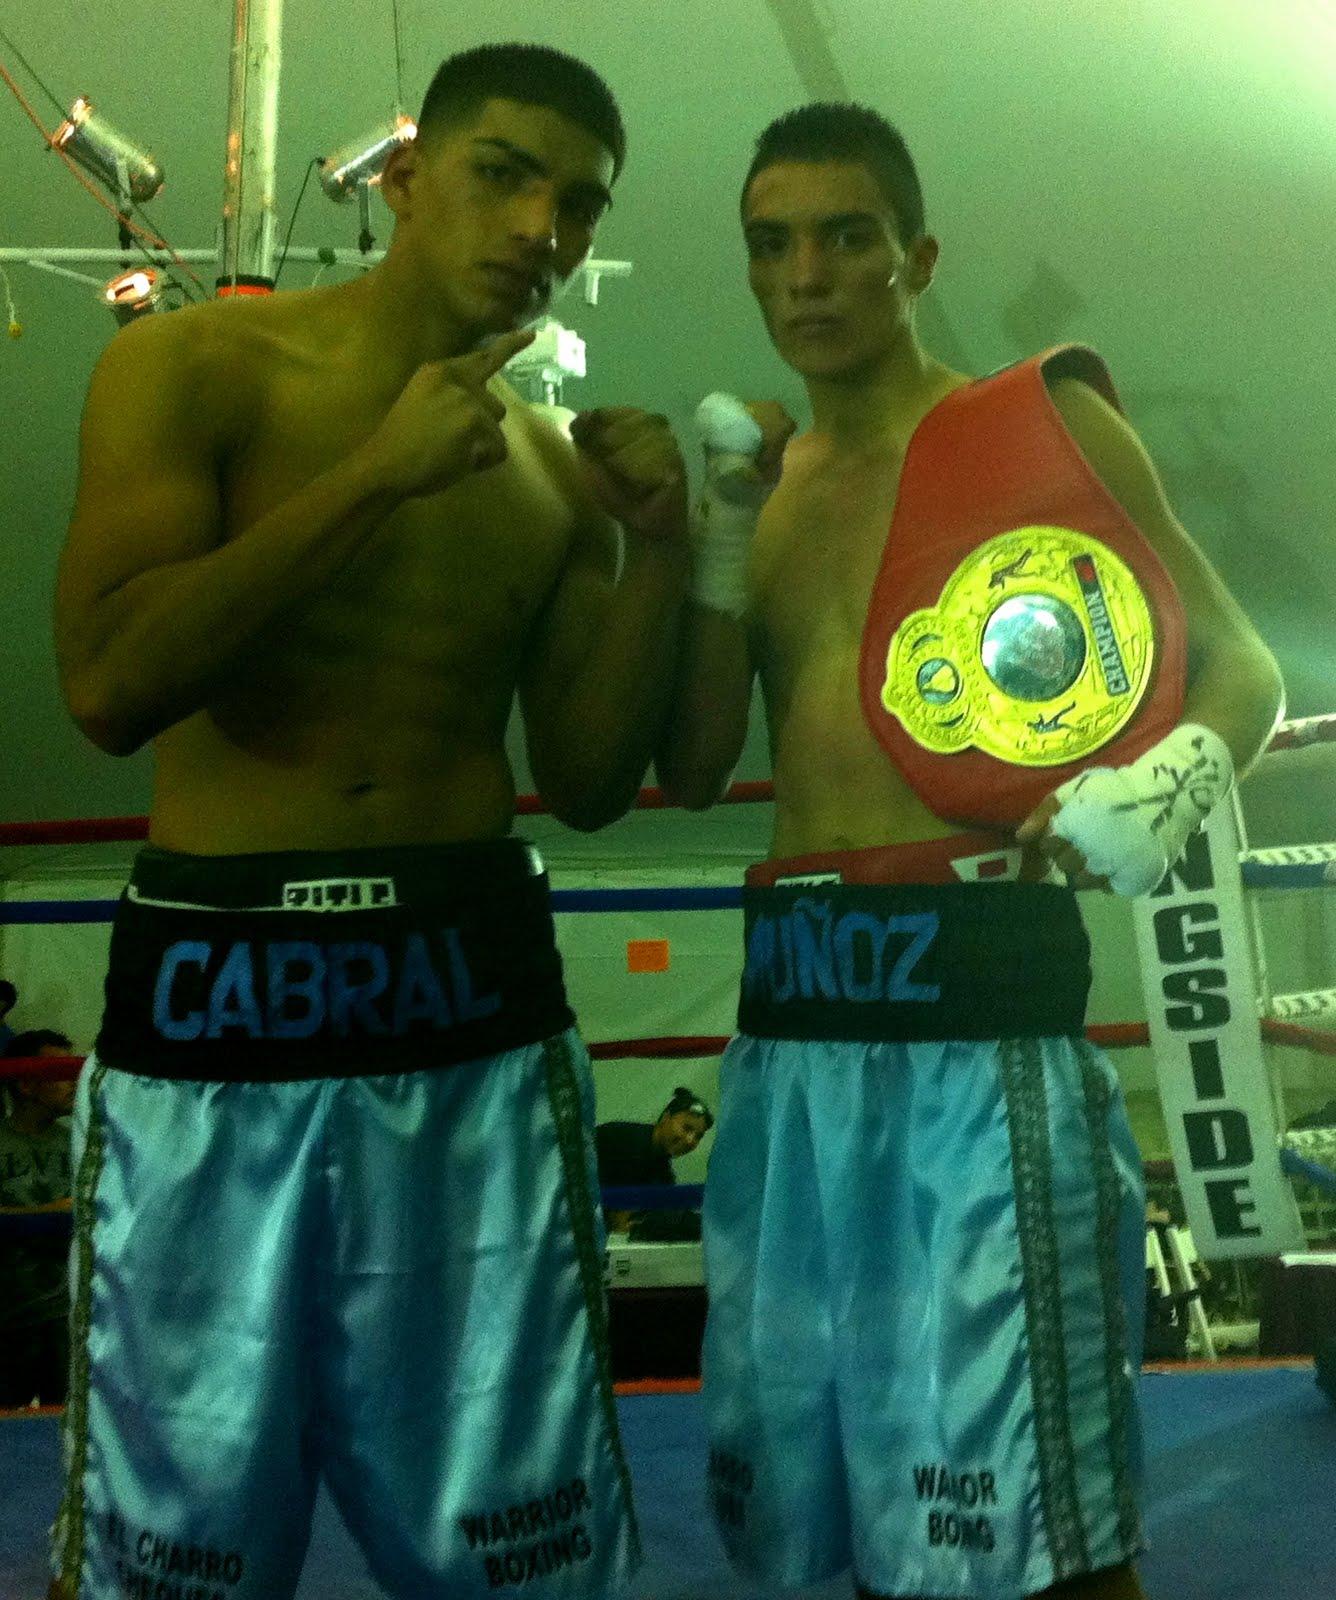 Free Sports Club: Boxing Results Last Night Ukboxing